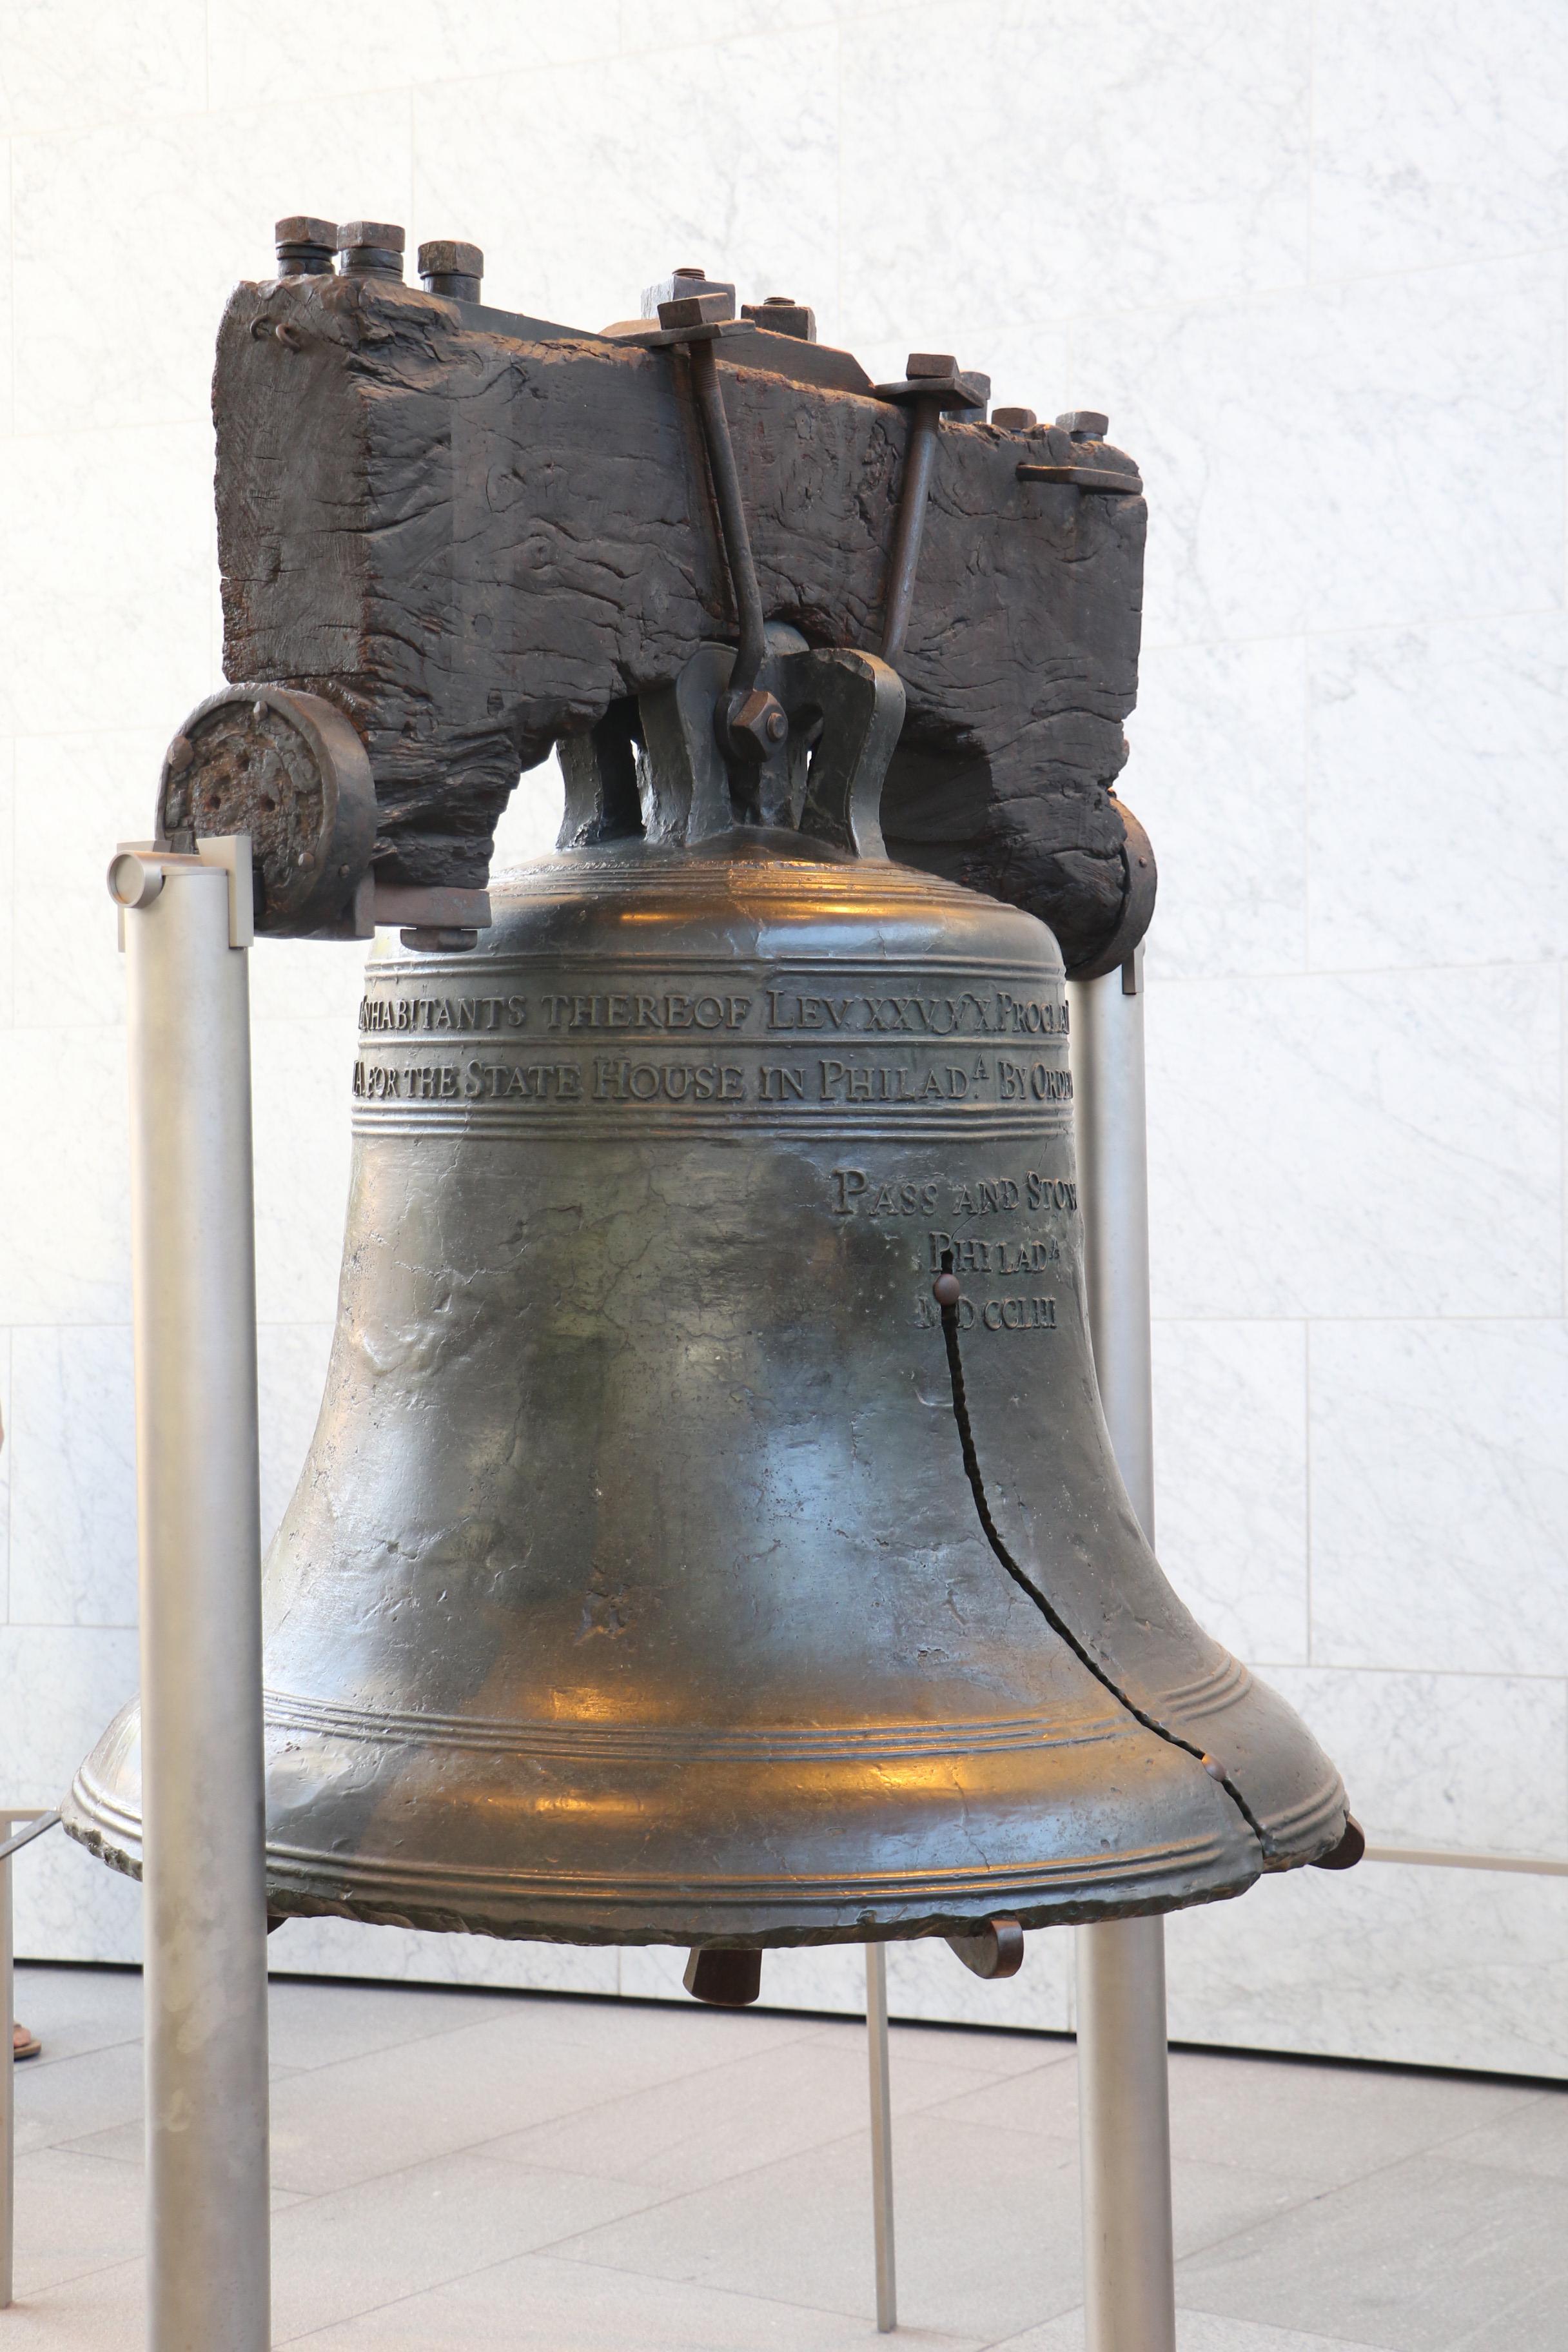 Liberty Bell on display in Philadelphia, Pennsylvania.